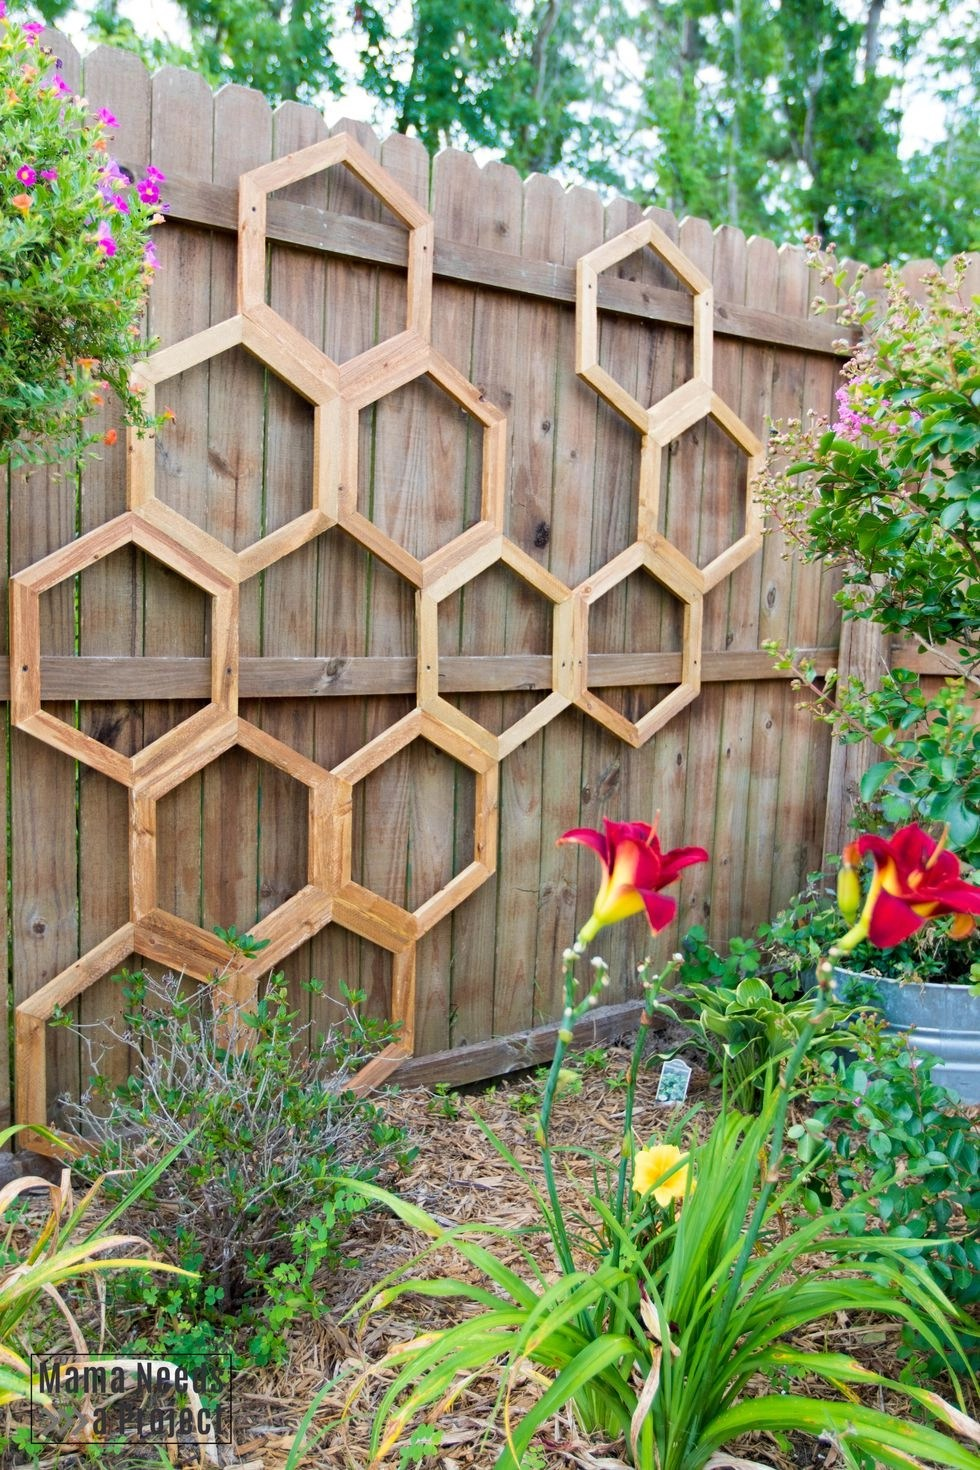 Diy honeycomb trellis Functional DIY Trellis Ideas To Beautify Your Garden In Style